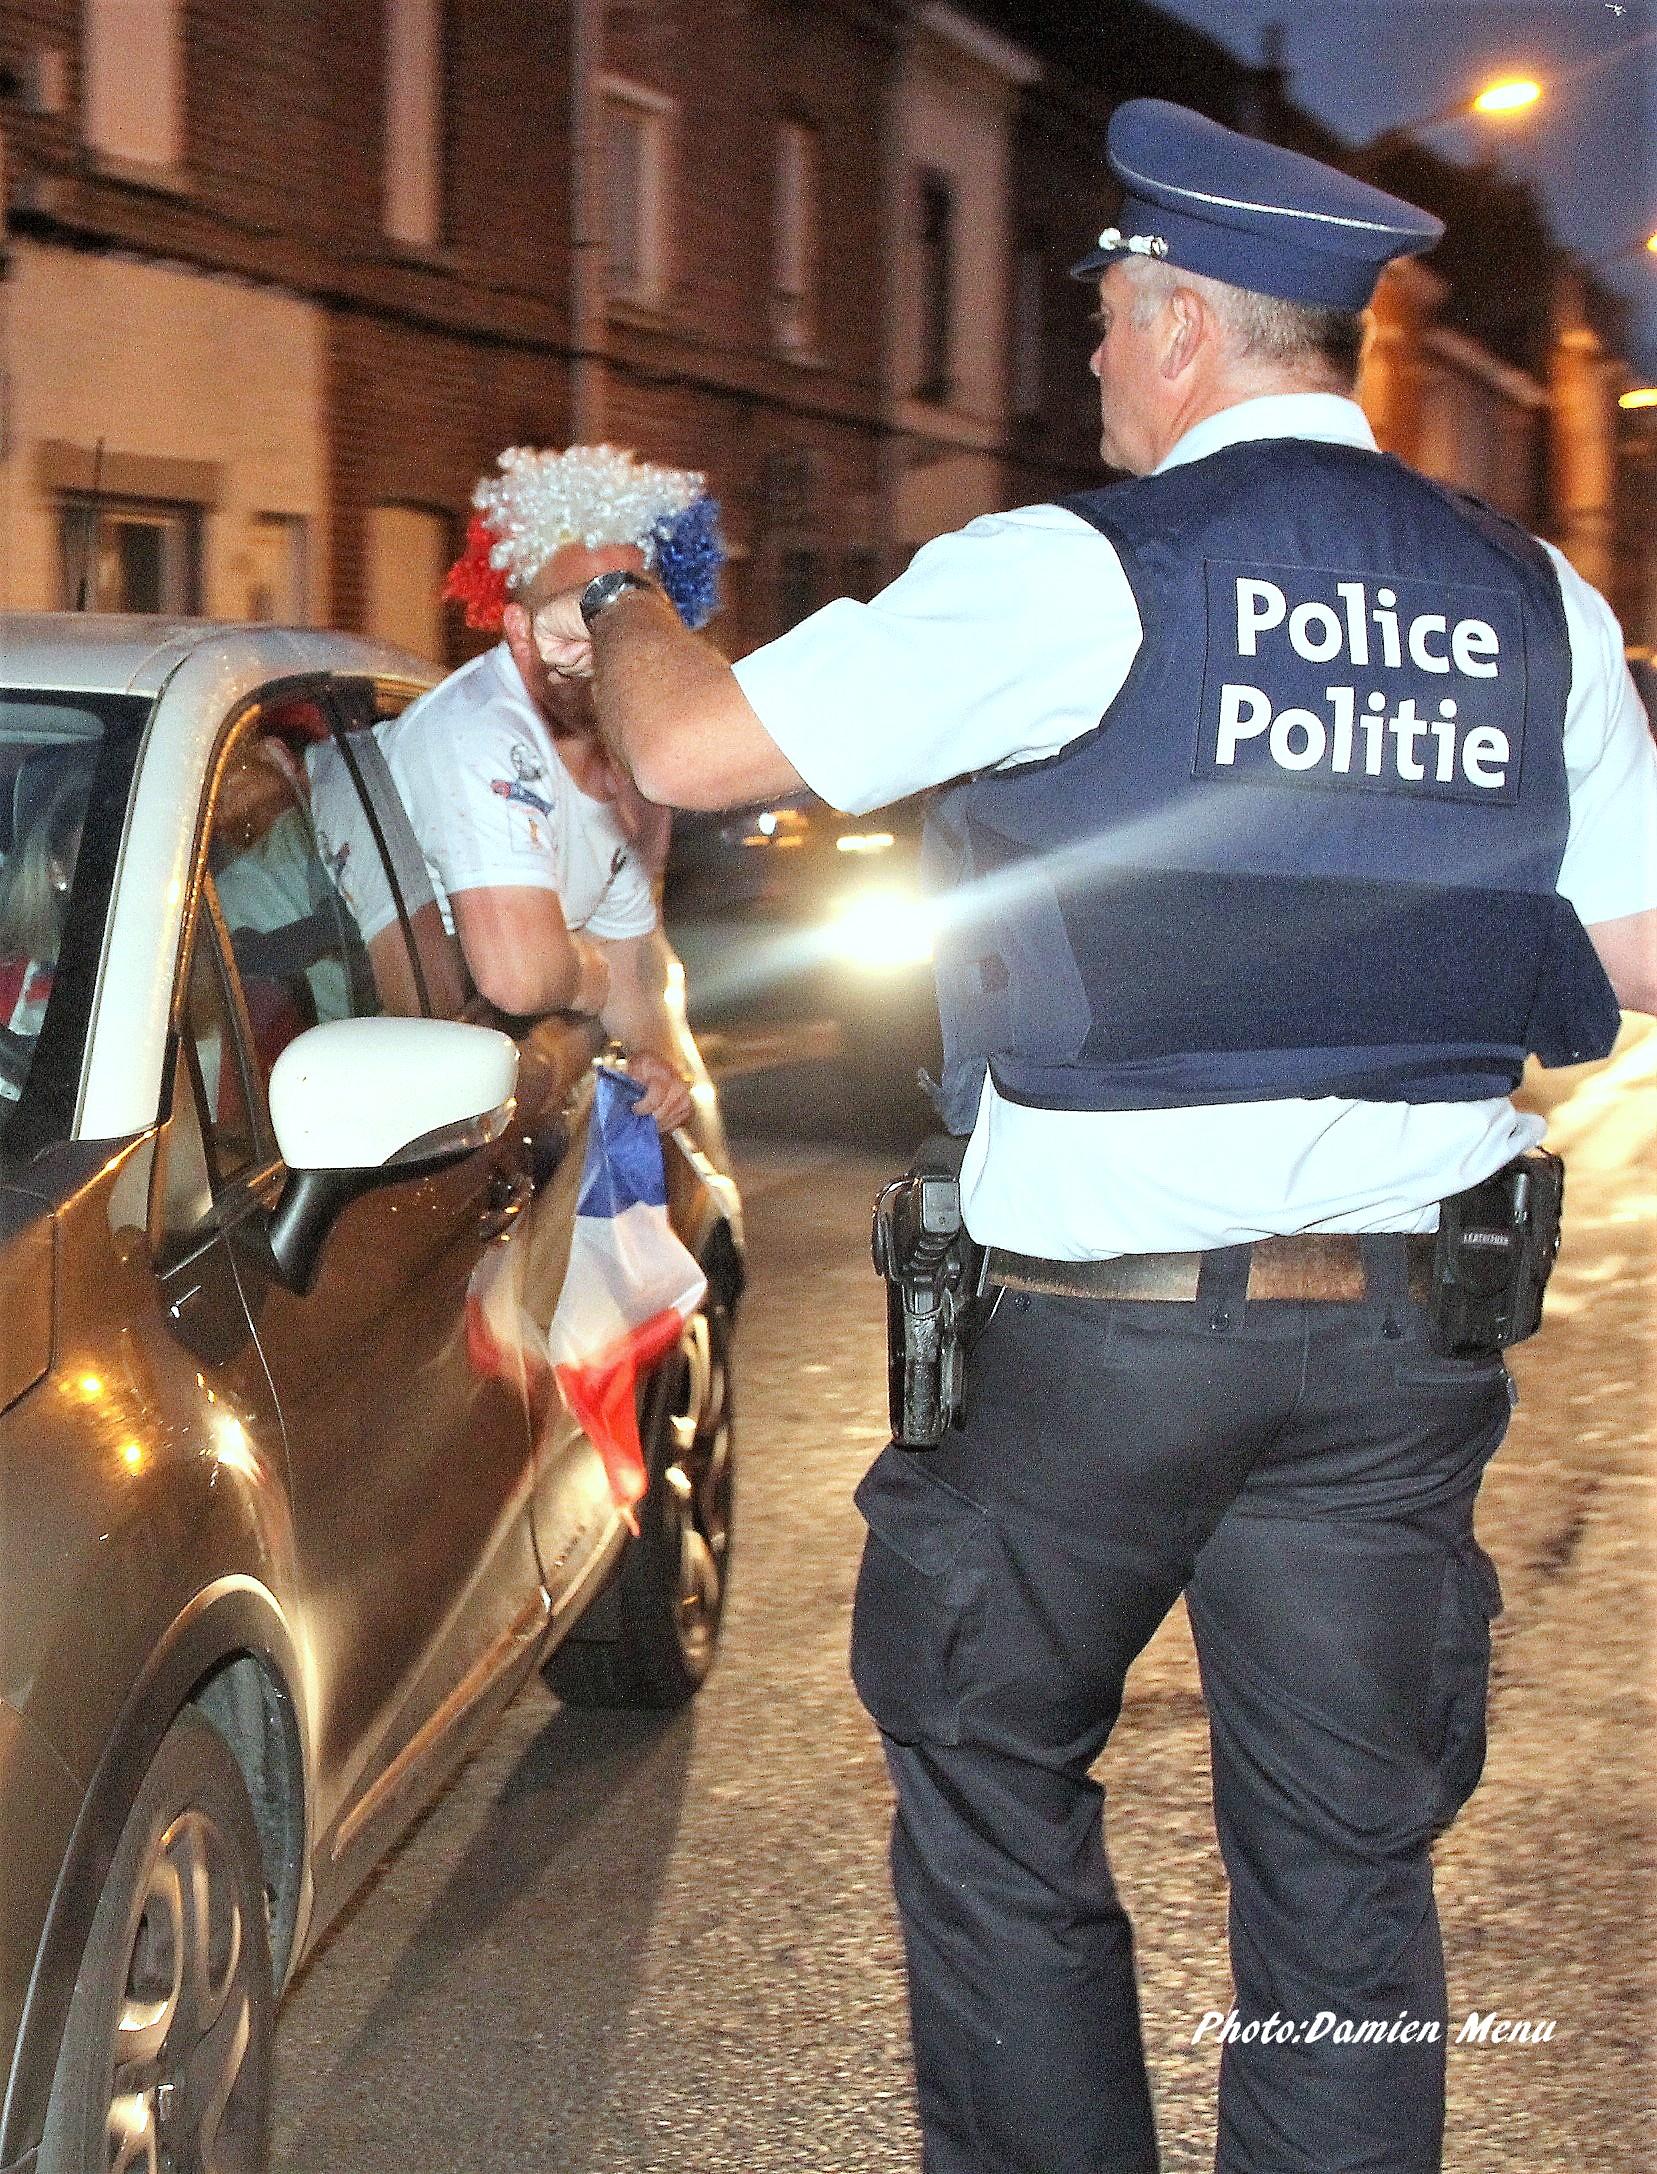 Blog police